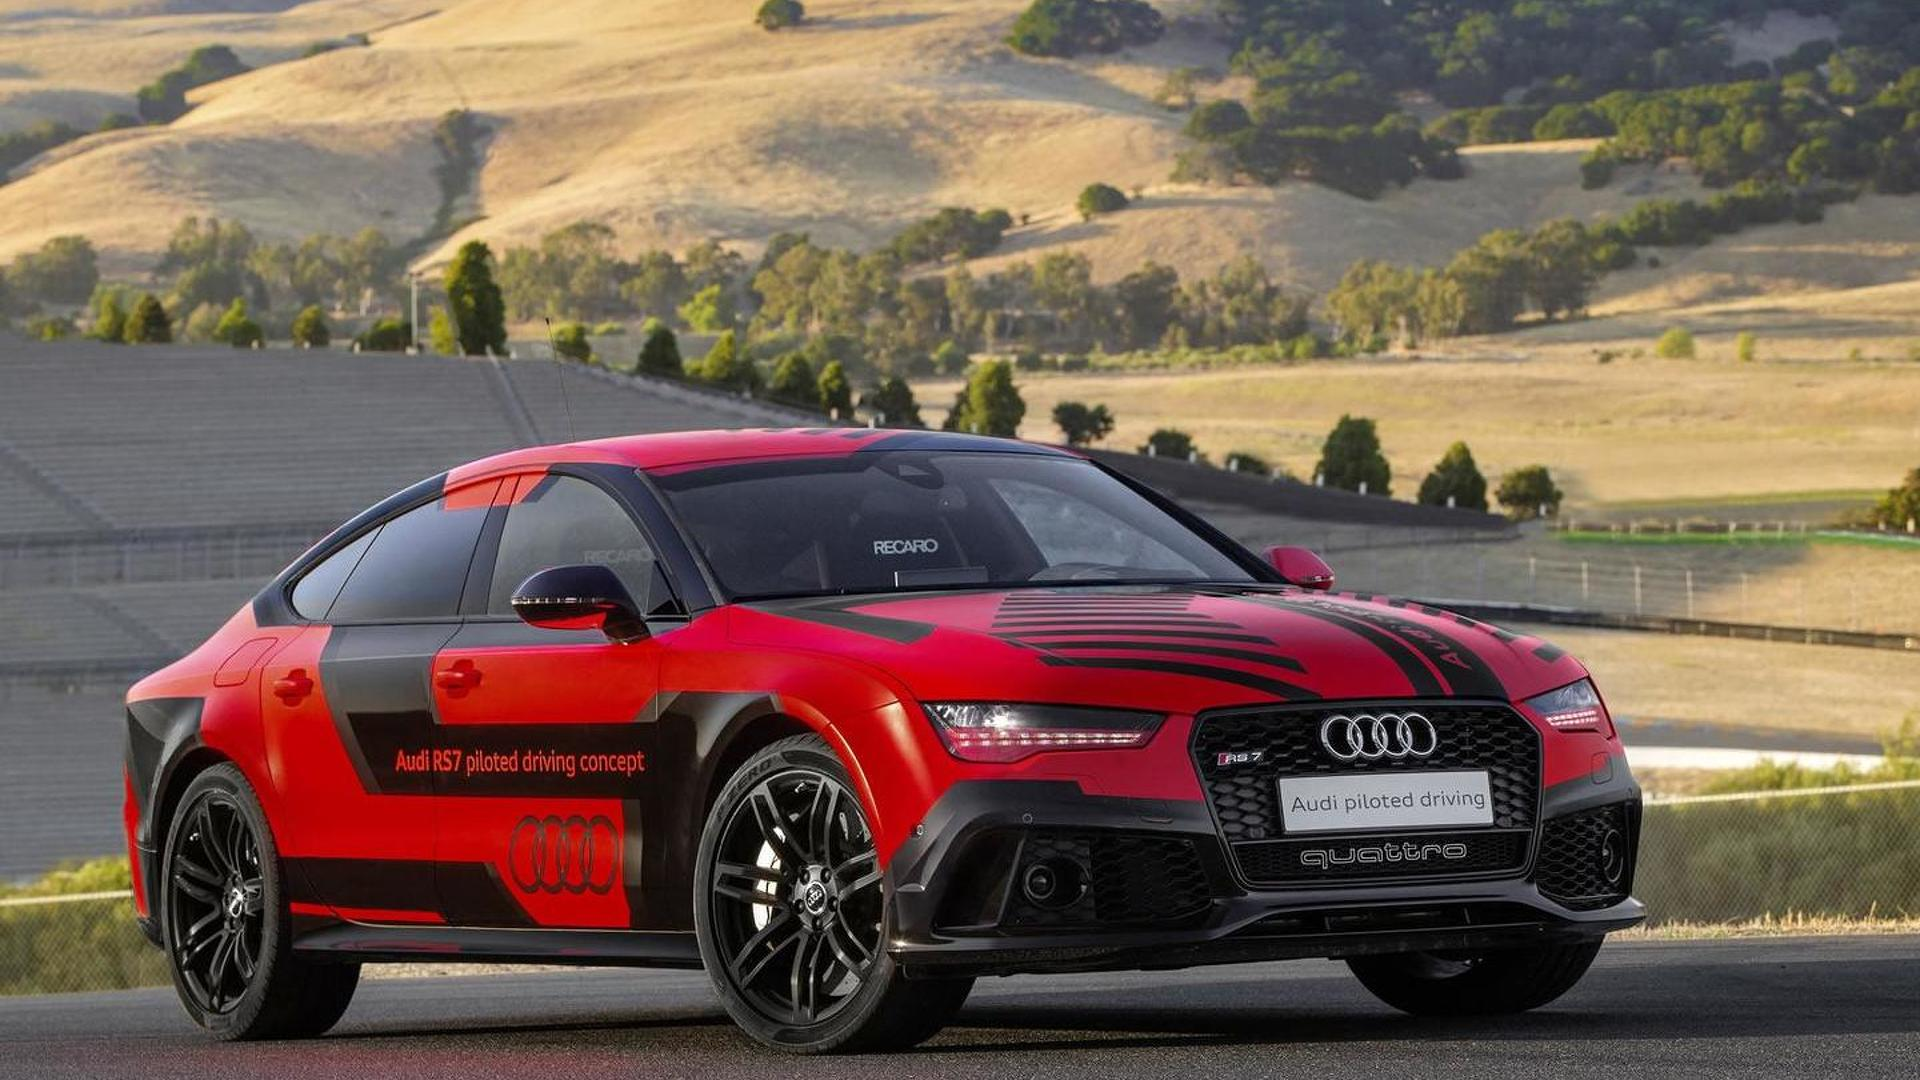 Kelebihan Audi Rs7 2015 Tangguh